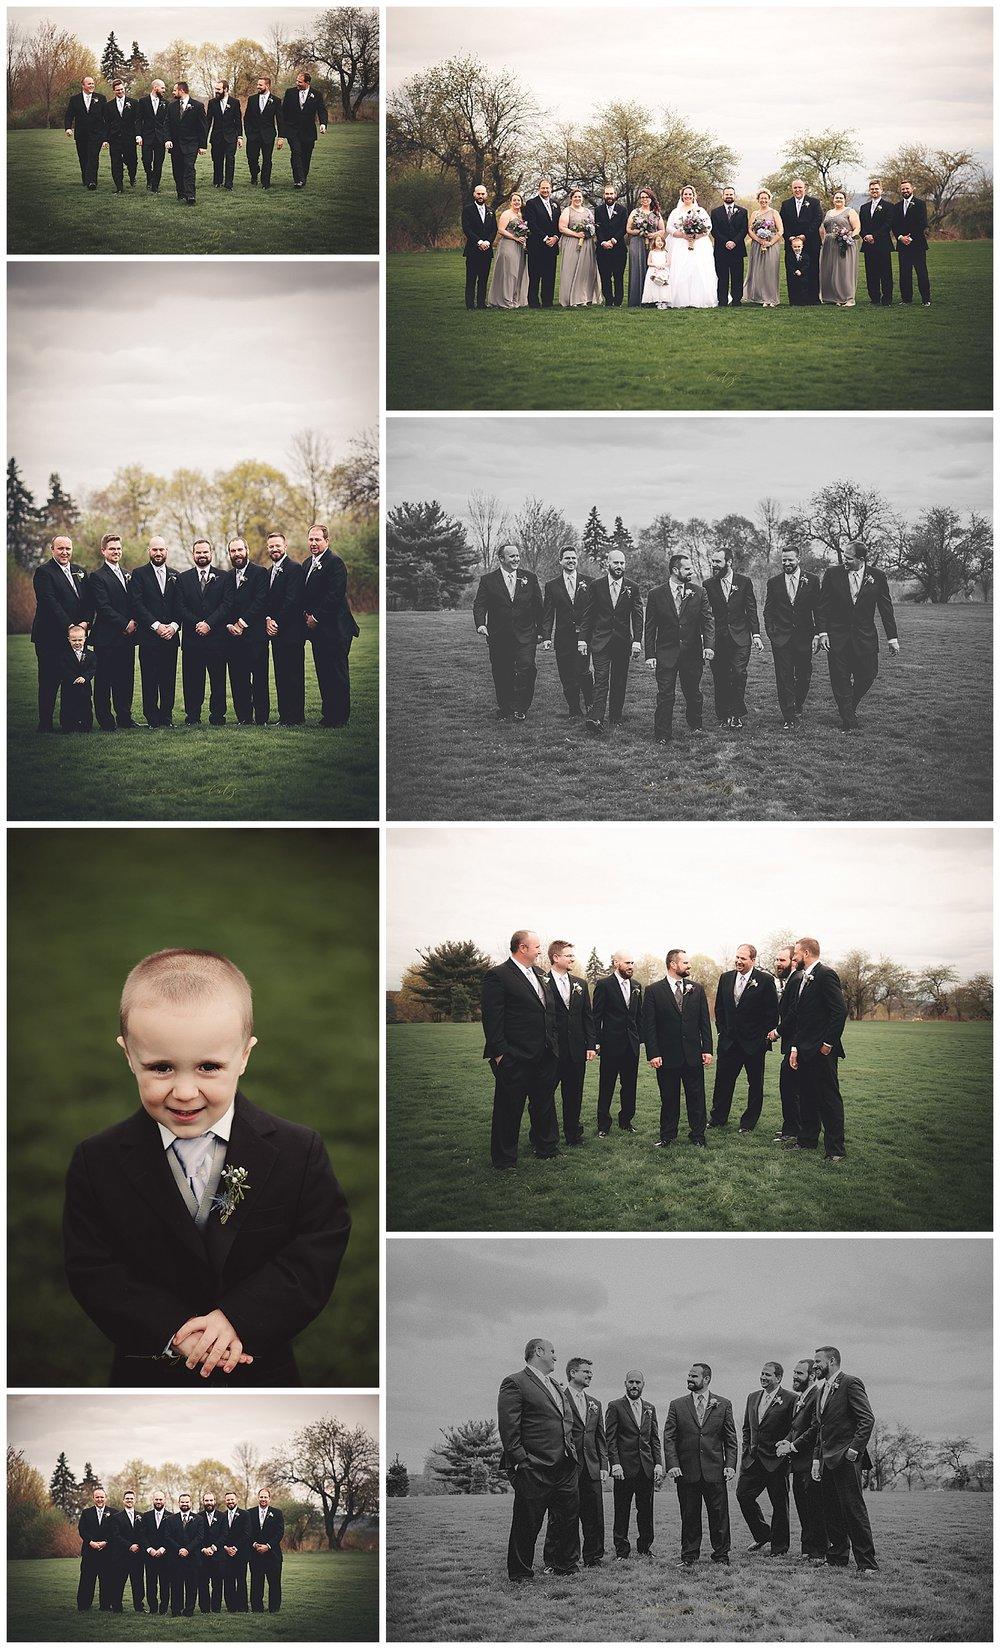 Hayfield-House-Wedding-Photographer-in-Scranton-NEPA_0031.jpg